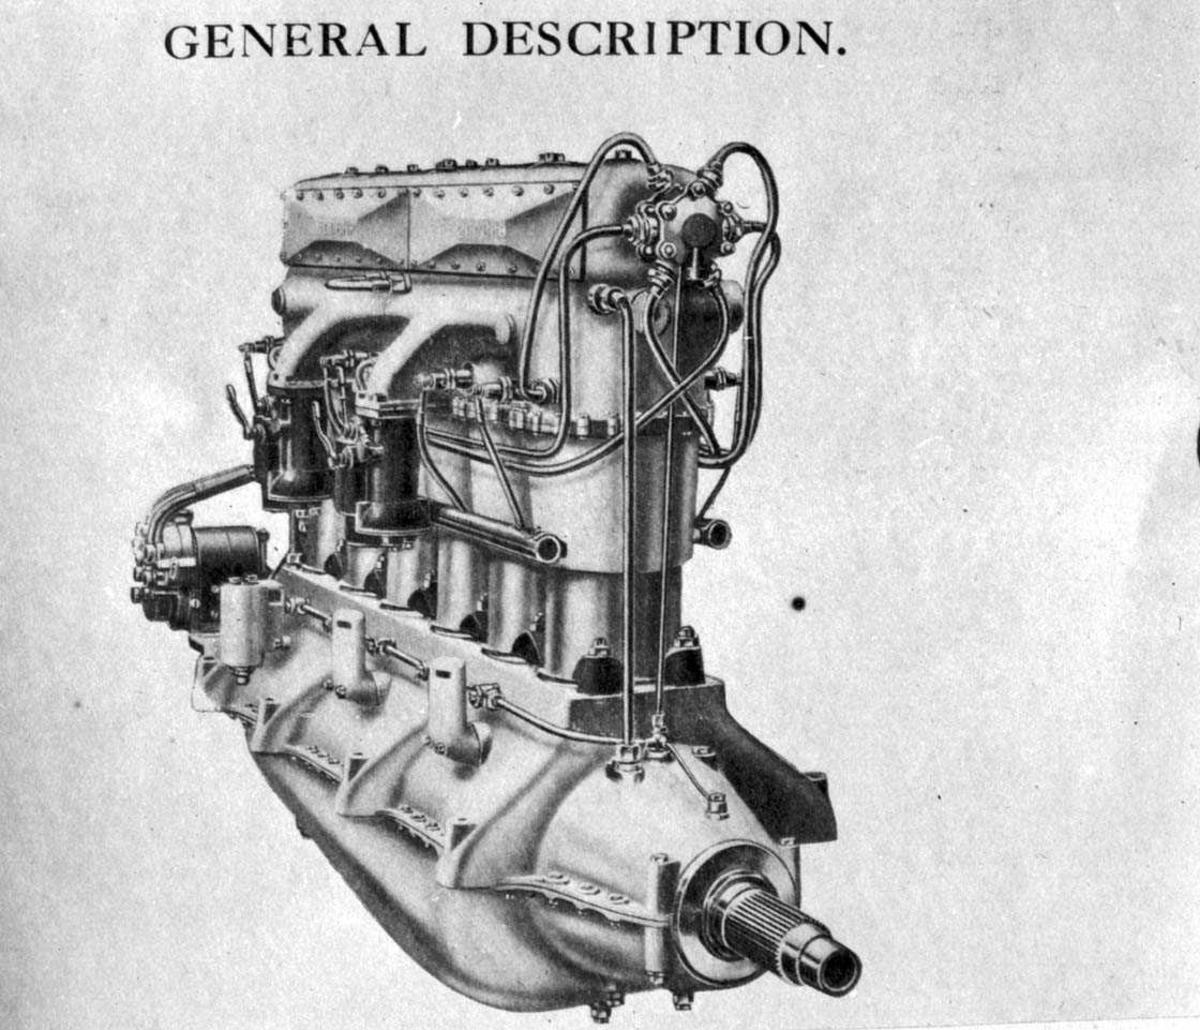 Motor. Flymotor Siddeley Puma